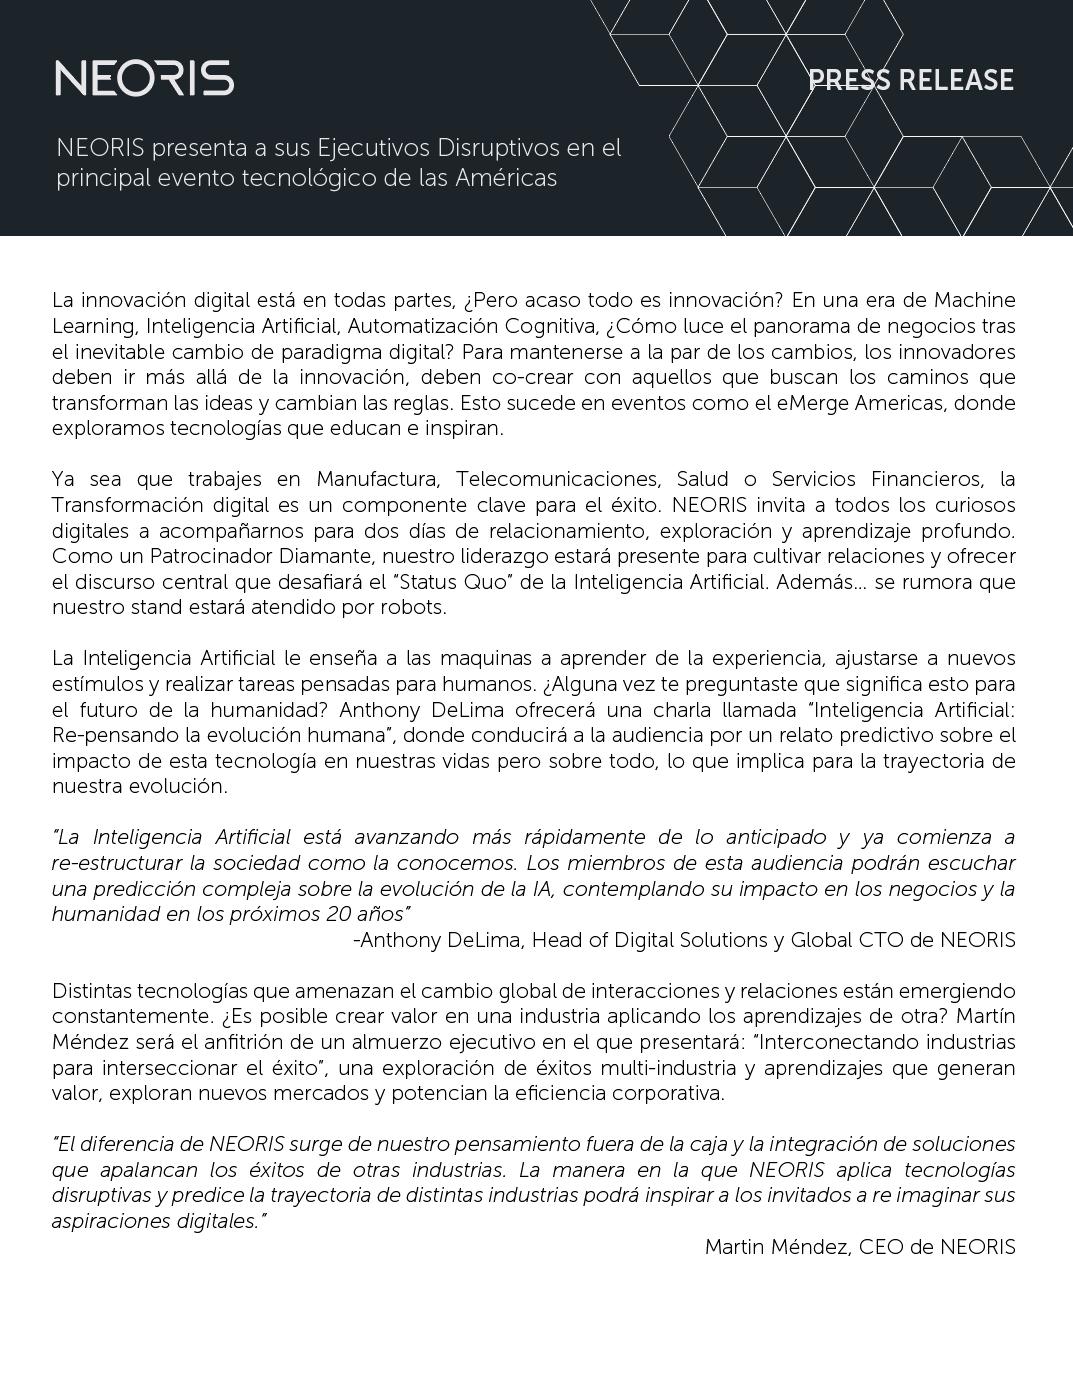 ejecutivos_disruptivos.png